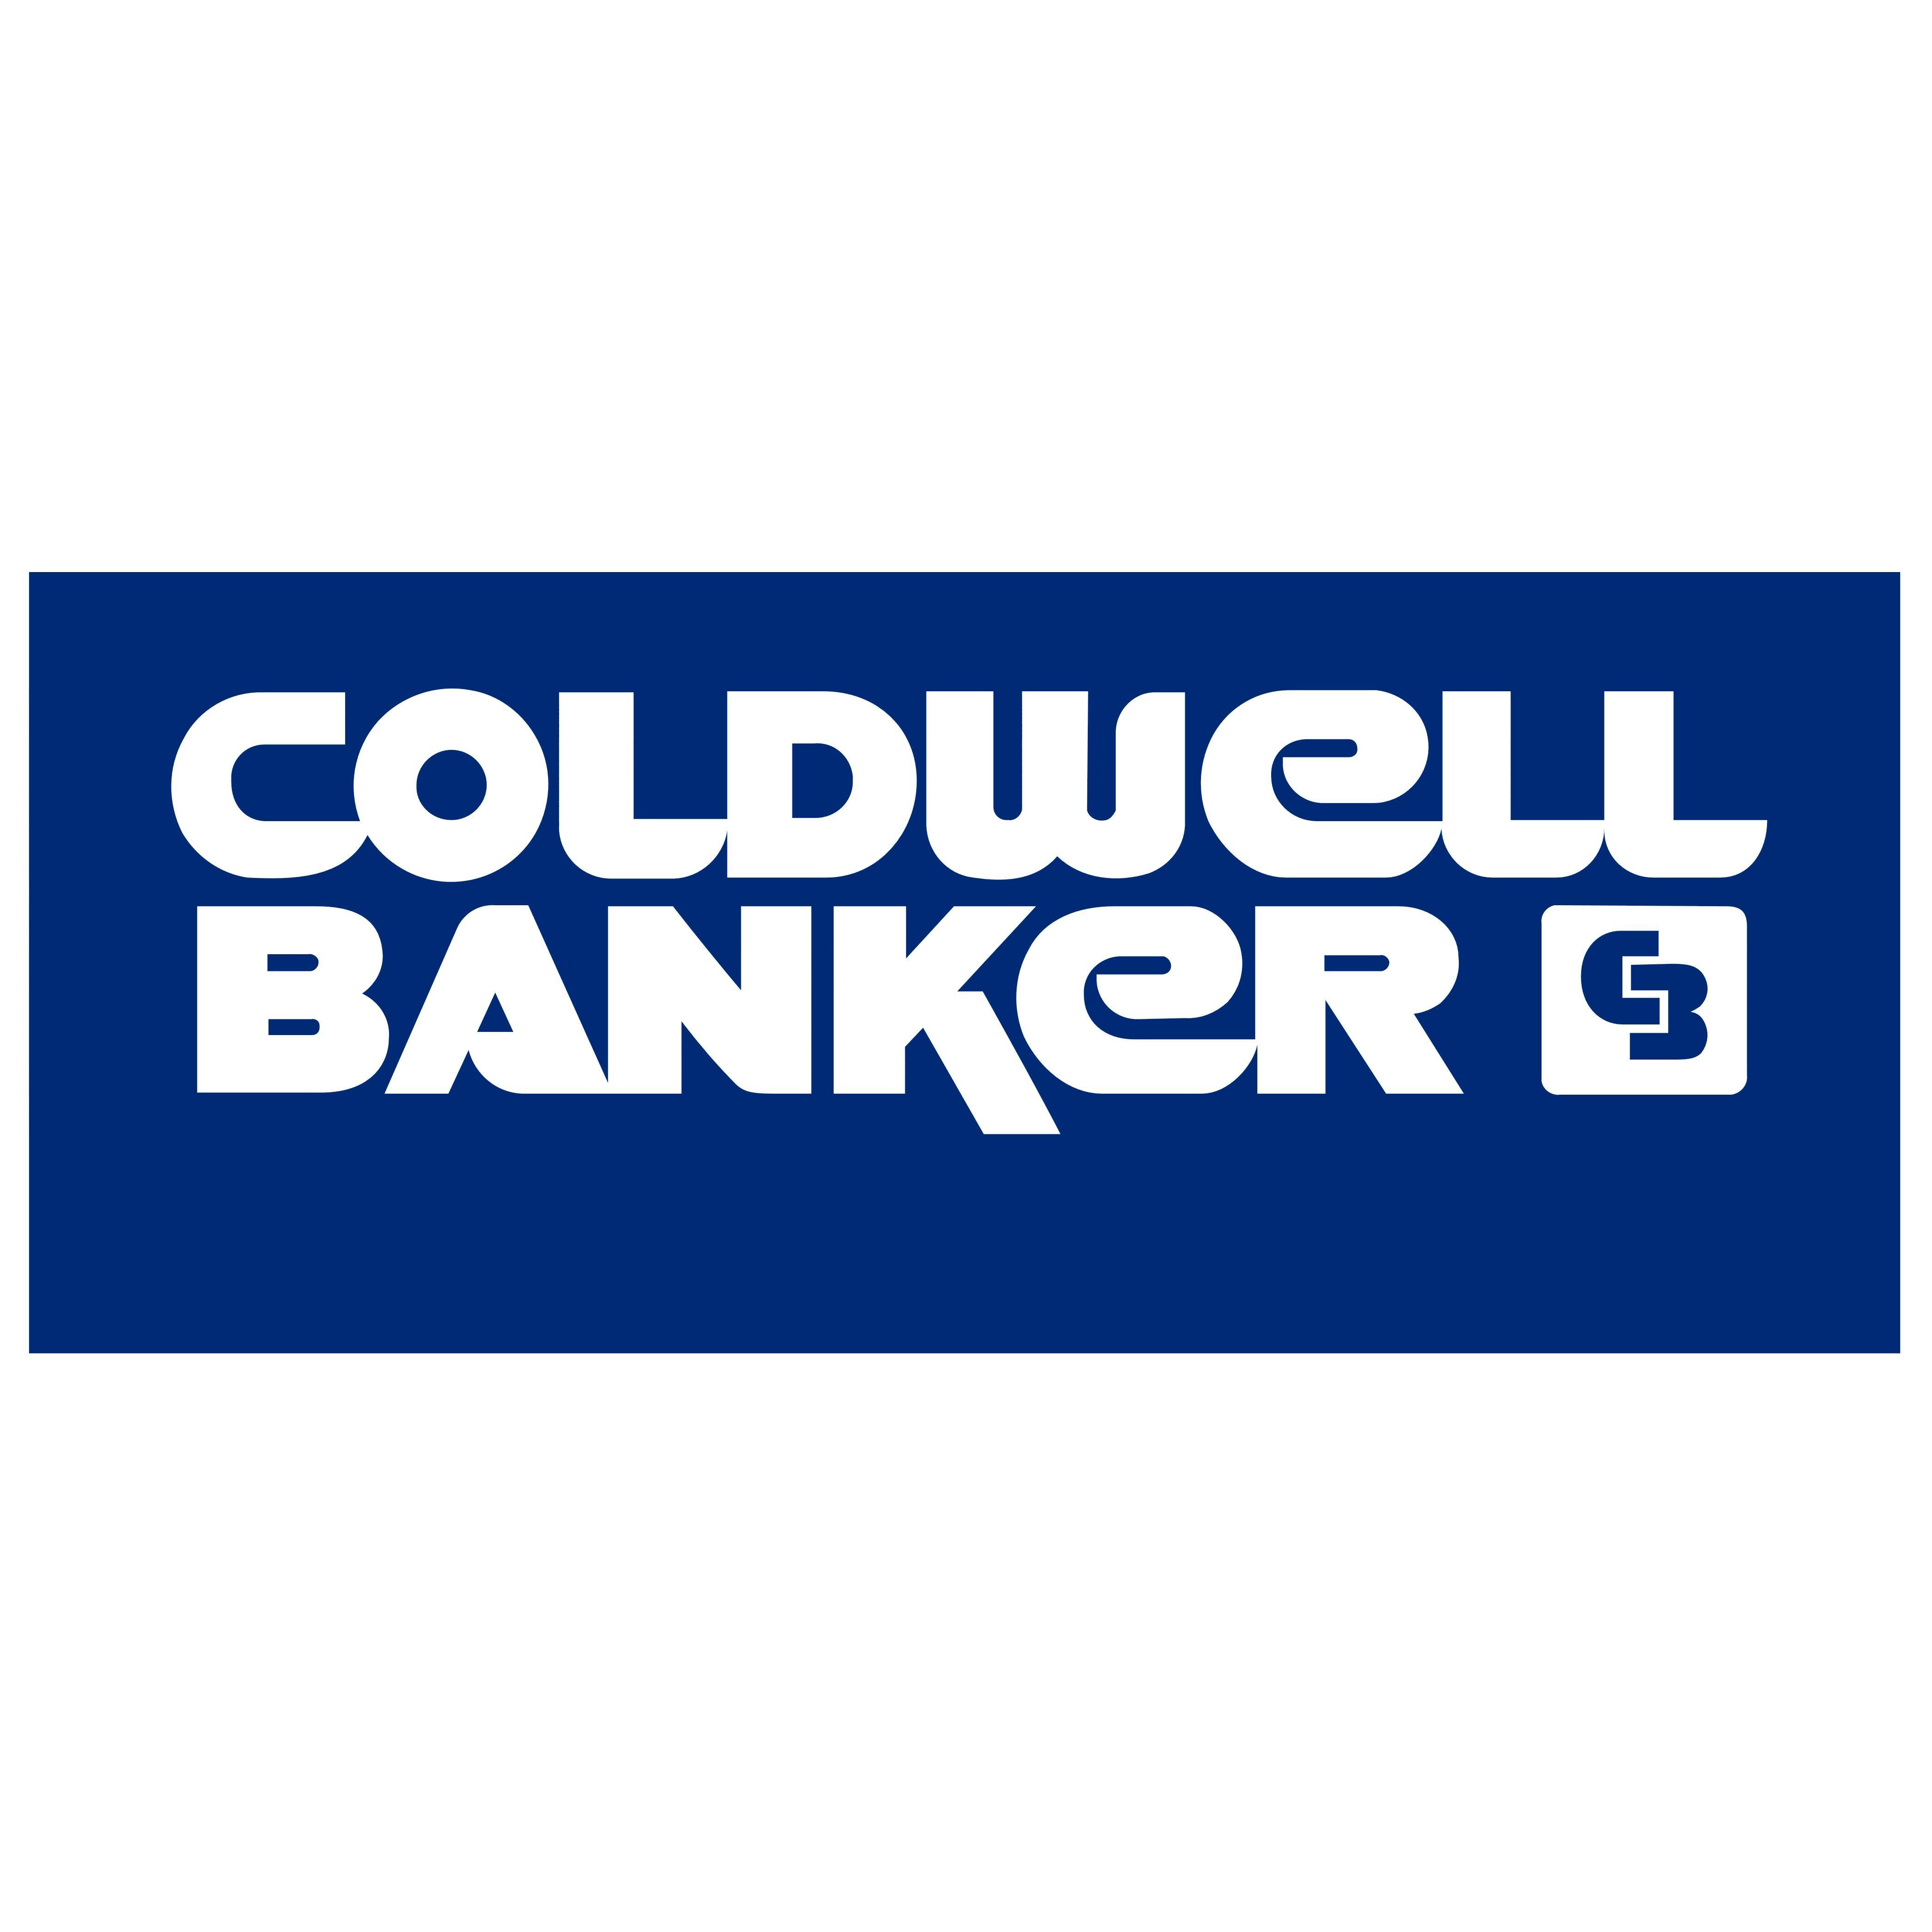 Anthony (Frank) Kelly II | Coldwell Banker/NRT in Manhattan